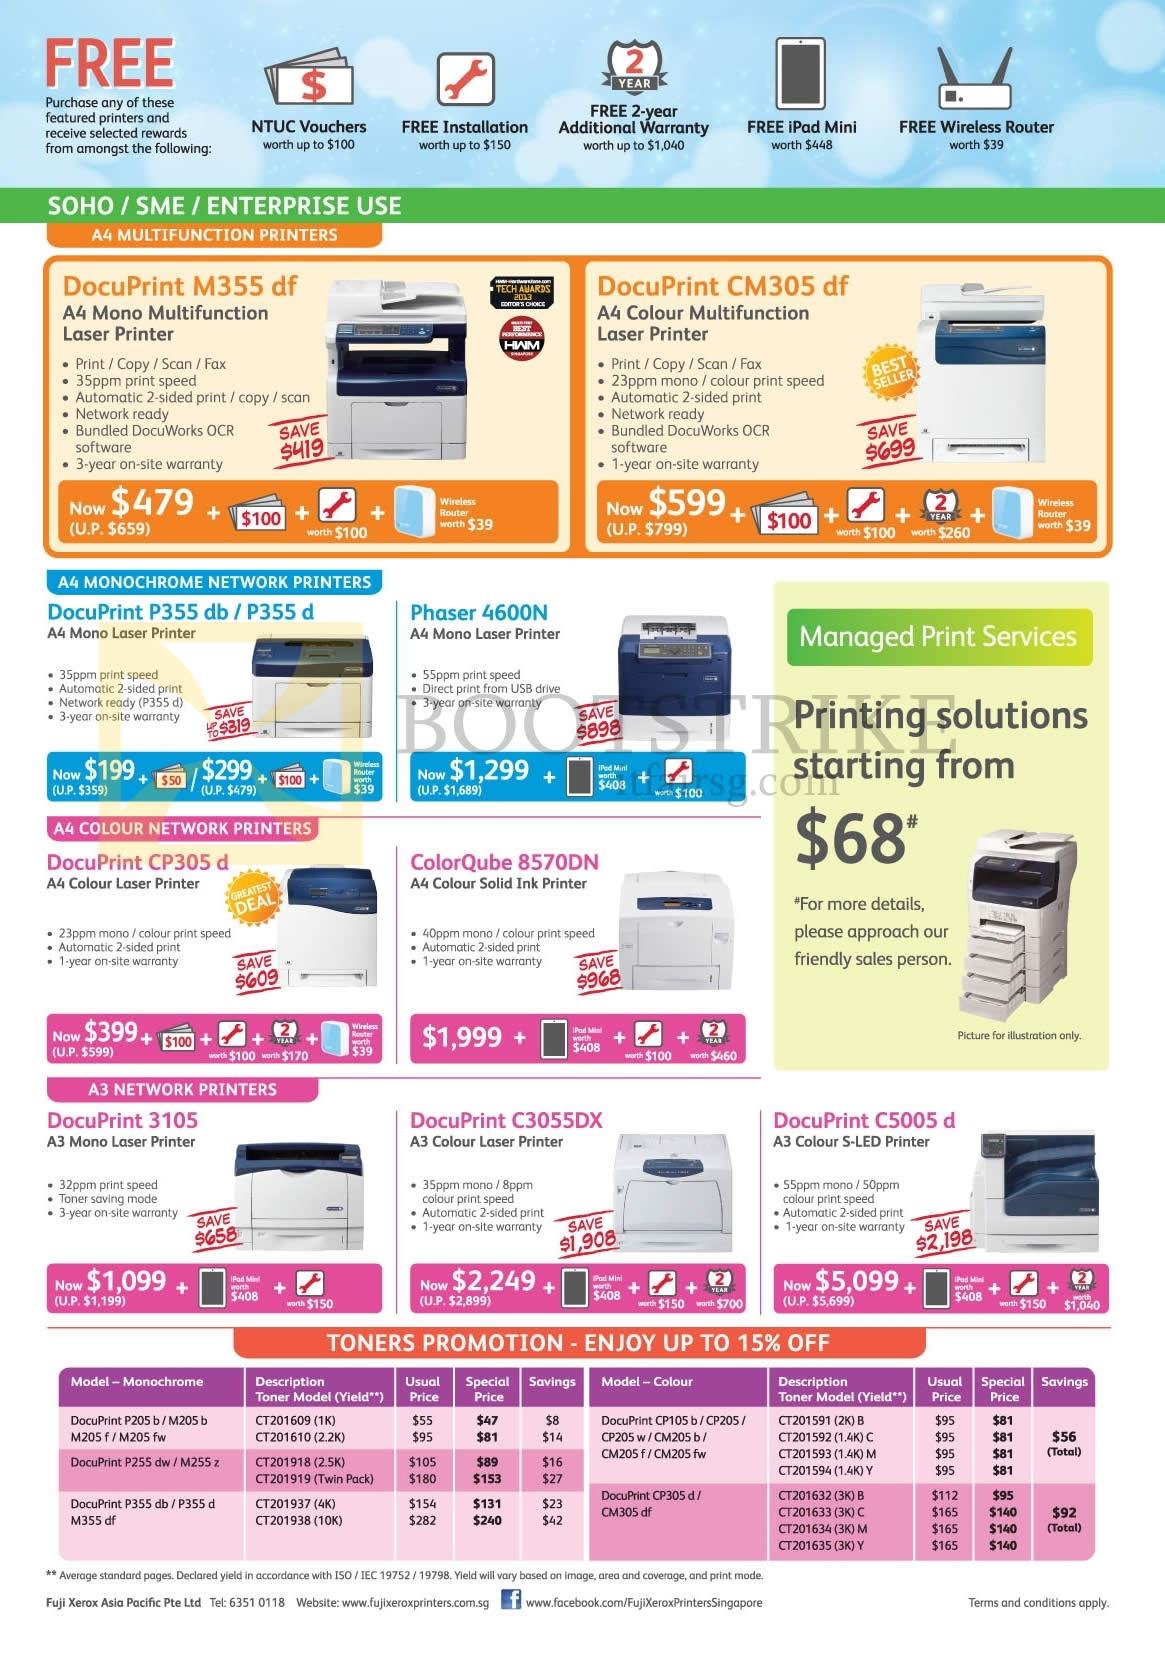 Fuji Xerox Printers Laser, Toners, DocuPrint M355 Df, CM305 Df, P355